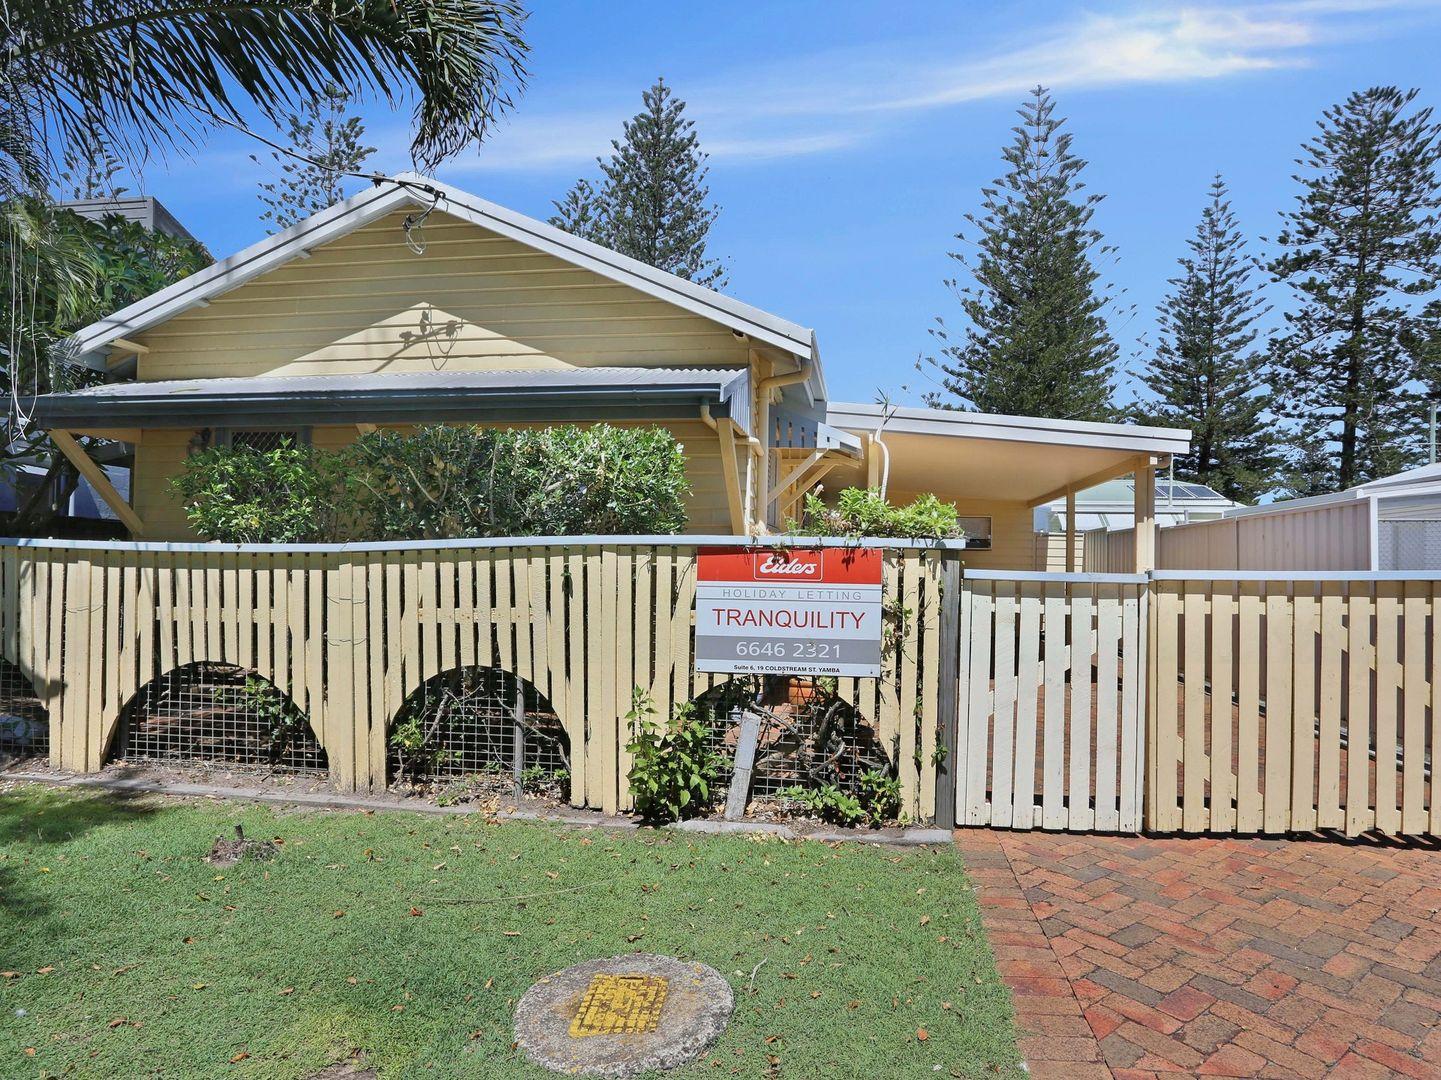 Tranquility 13 Harbour Street, Yamba NSW 2464, Image 0